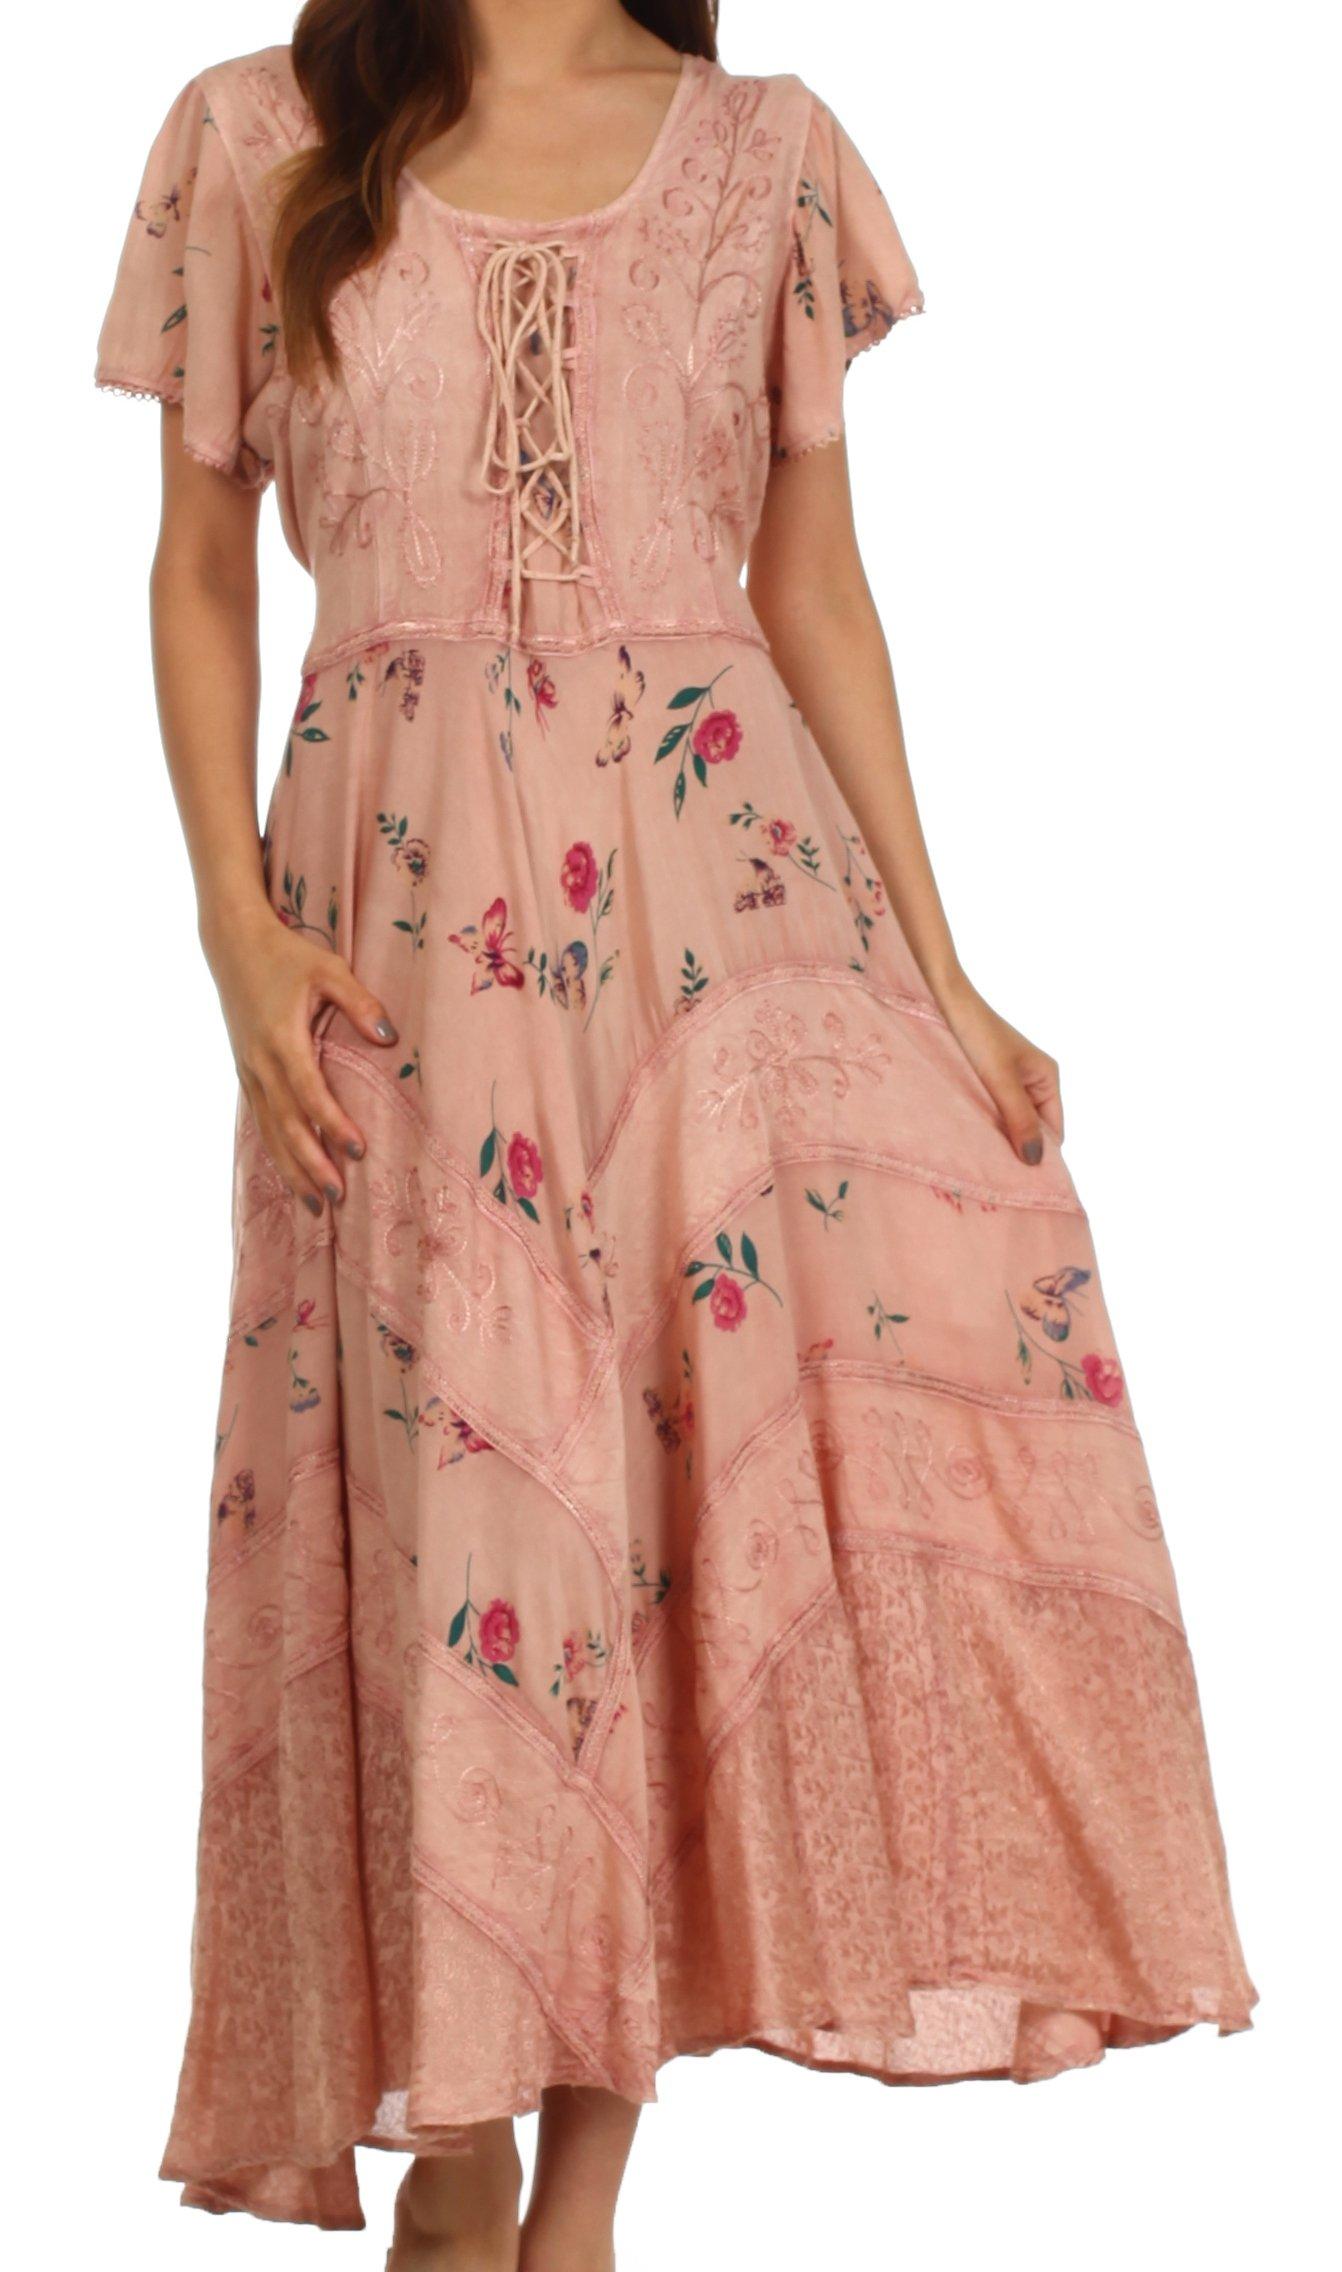 Sakkas 32311 Calliope Corset Style Dress - Rose - 1X/2X by Sakkas